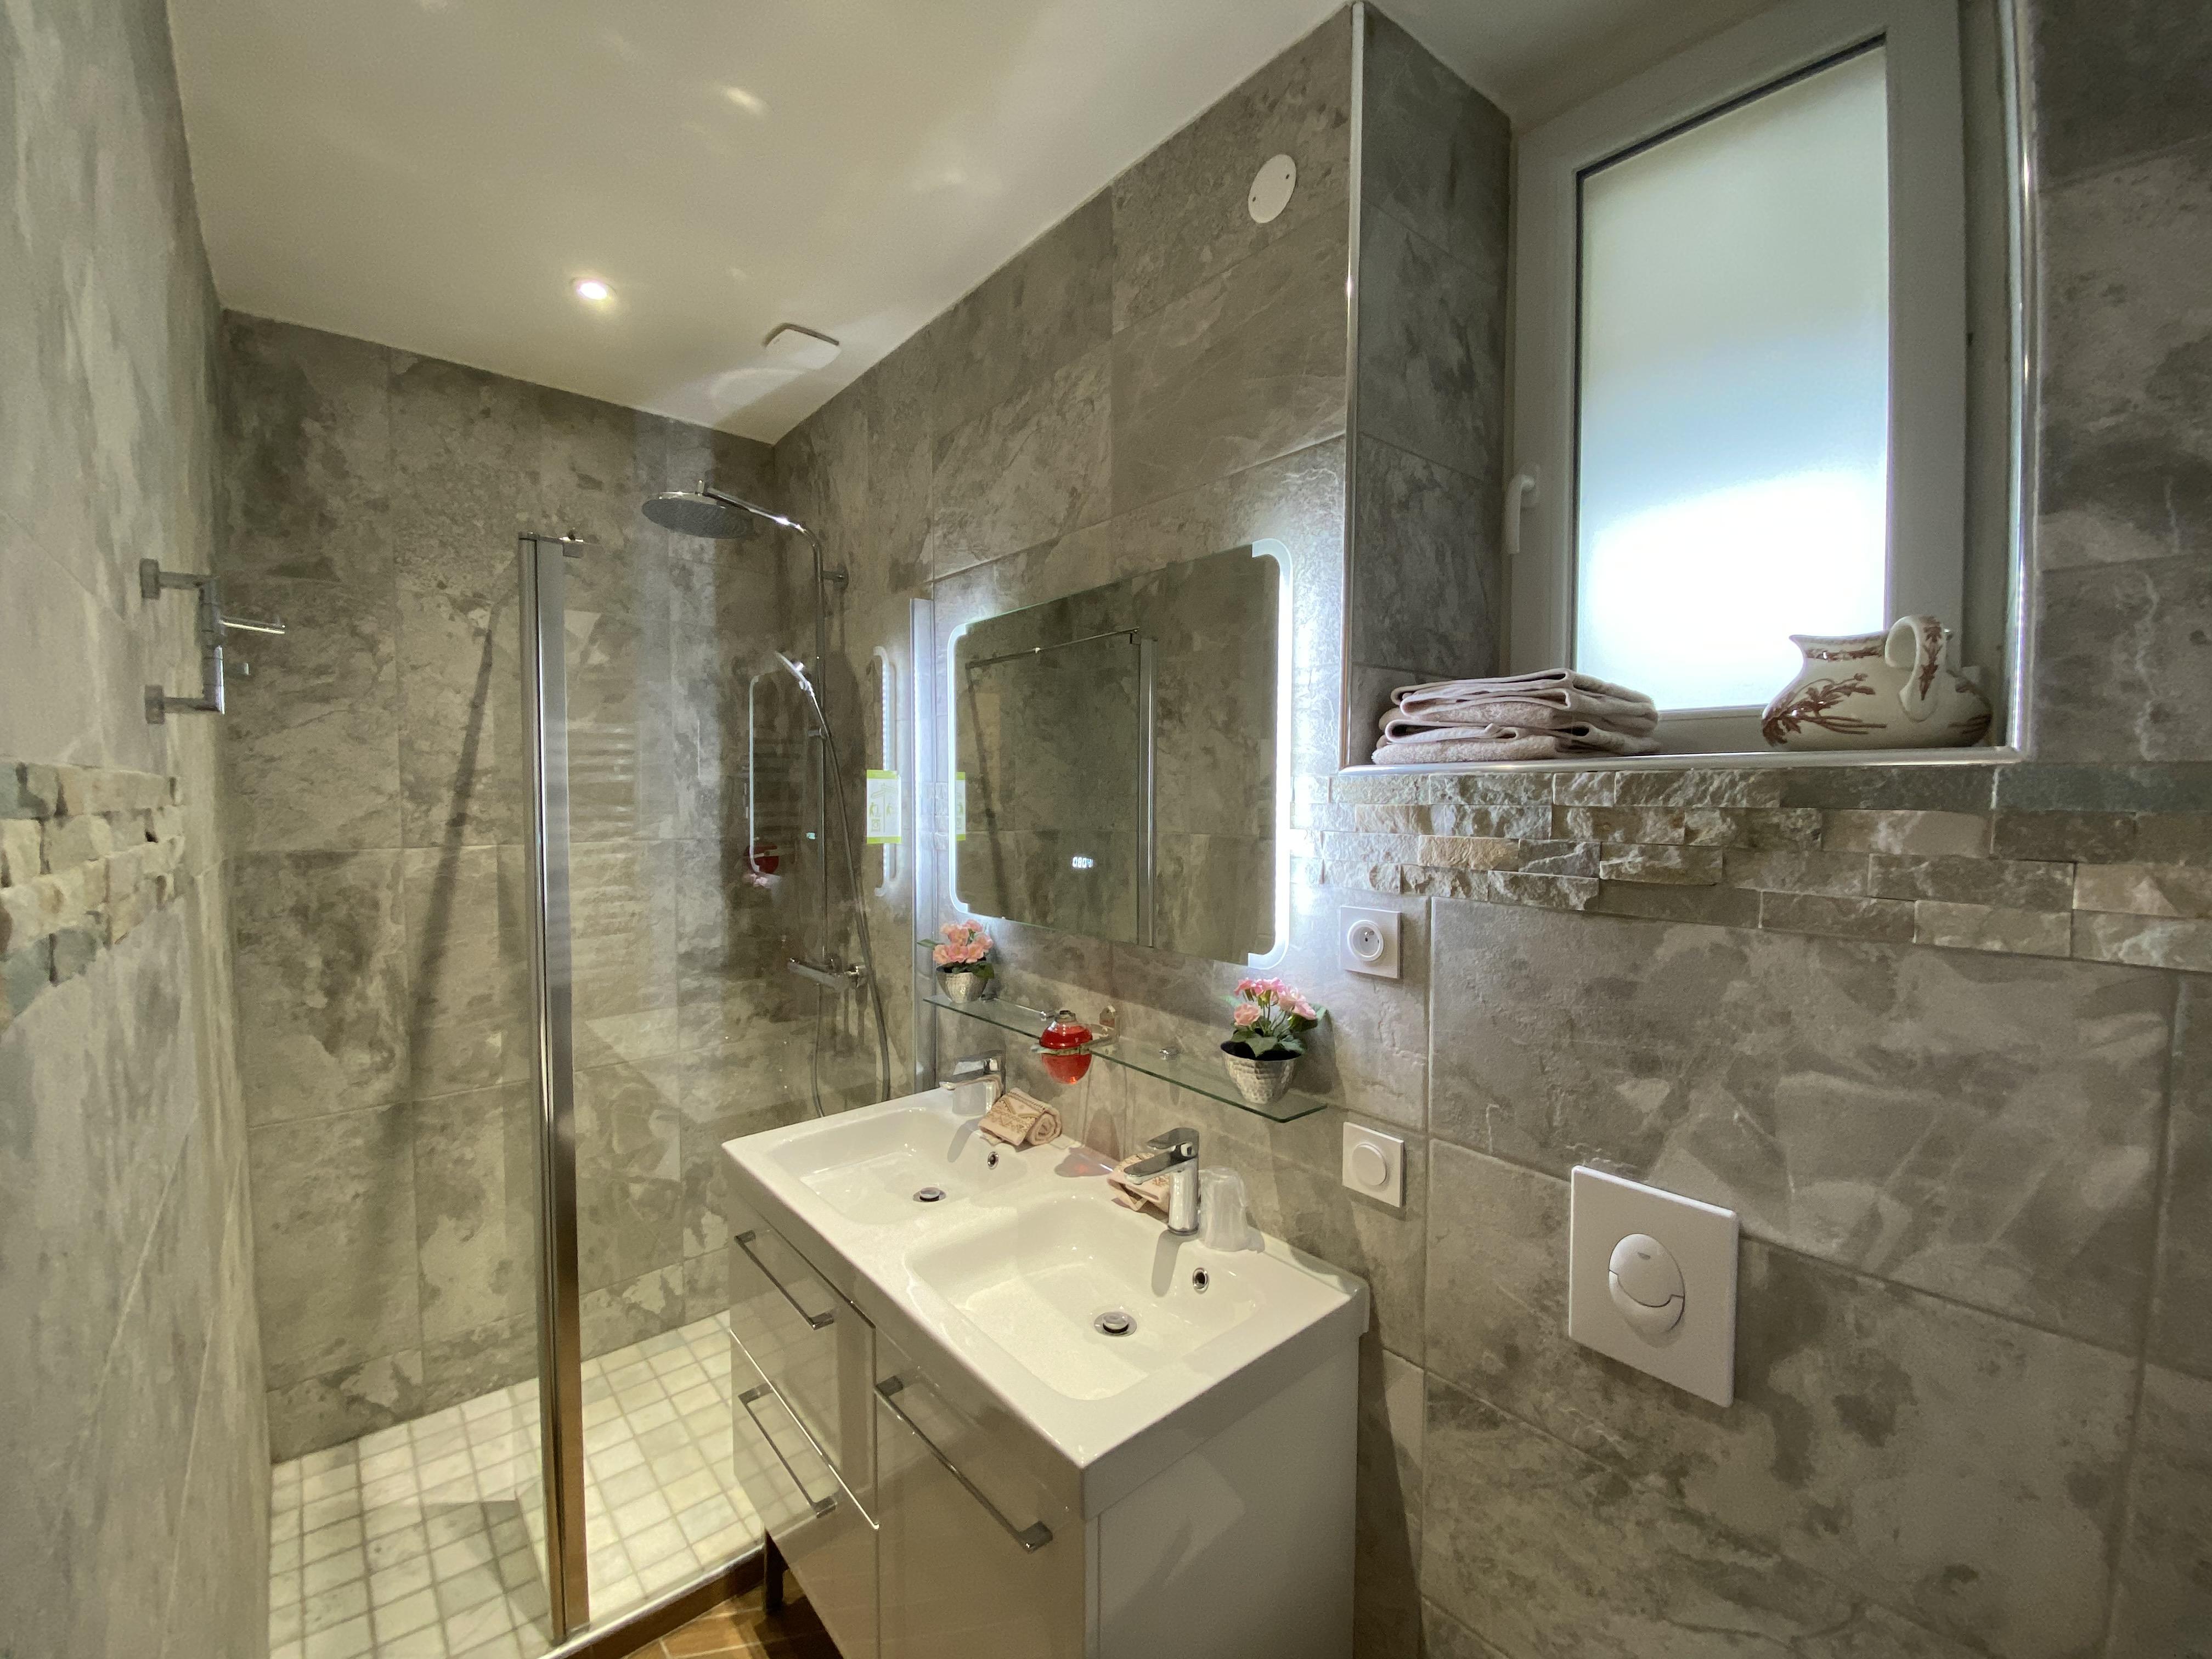 DDAY Aviators Le Manoir Bathroom B8